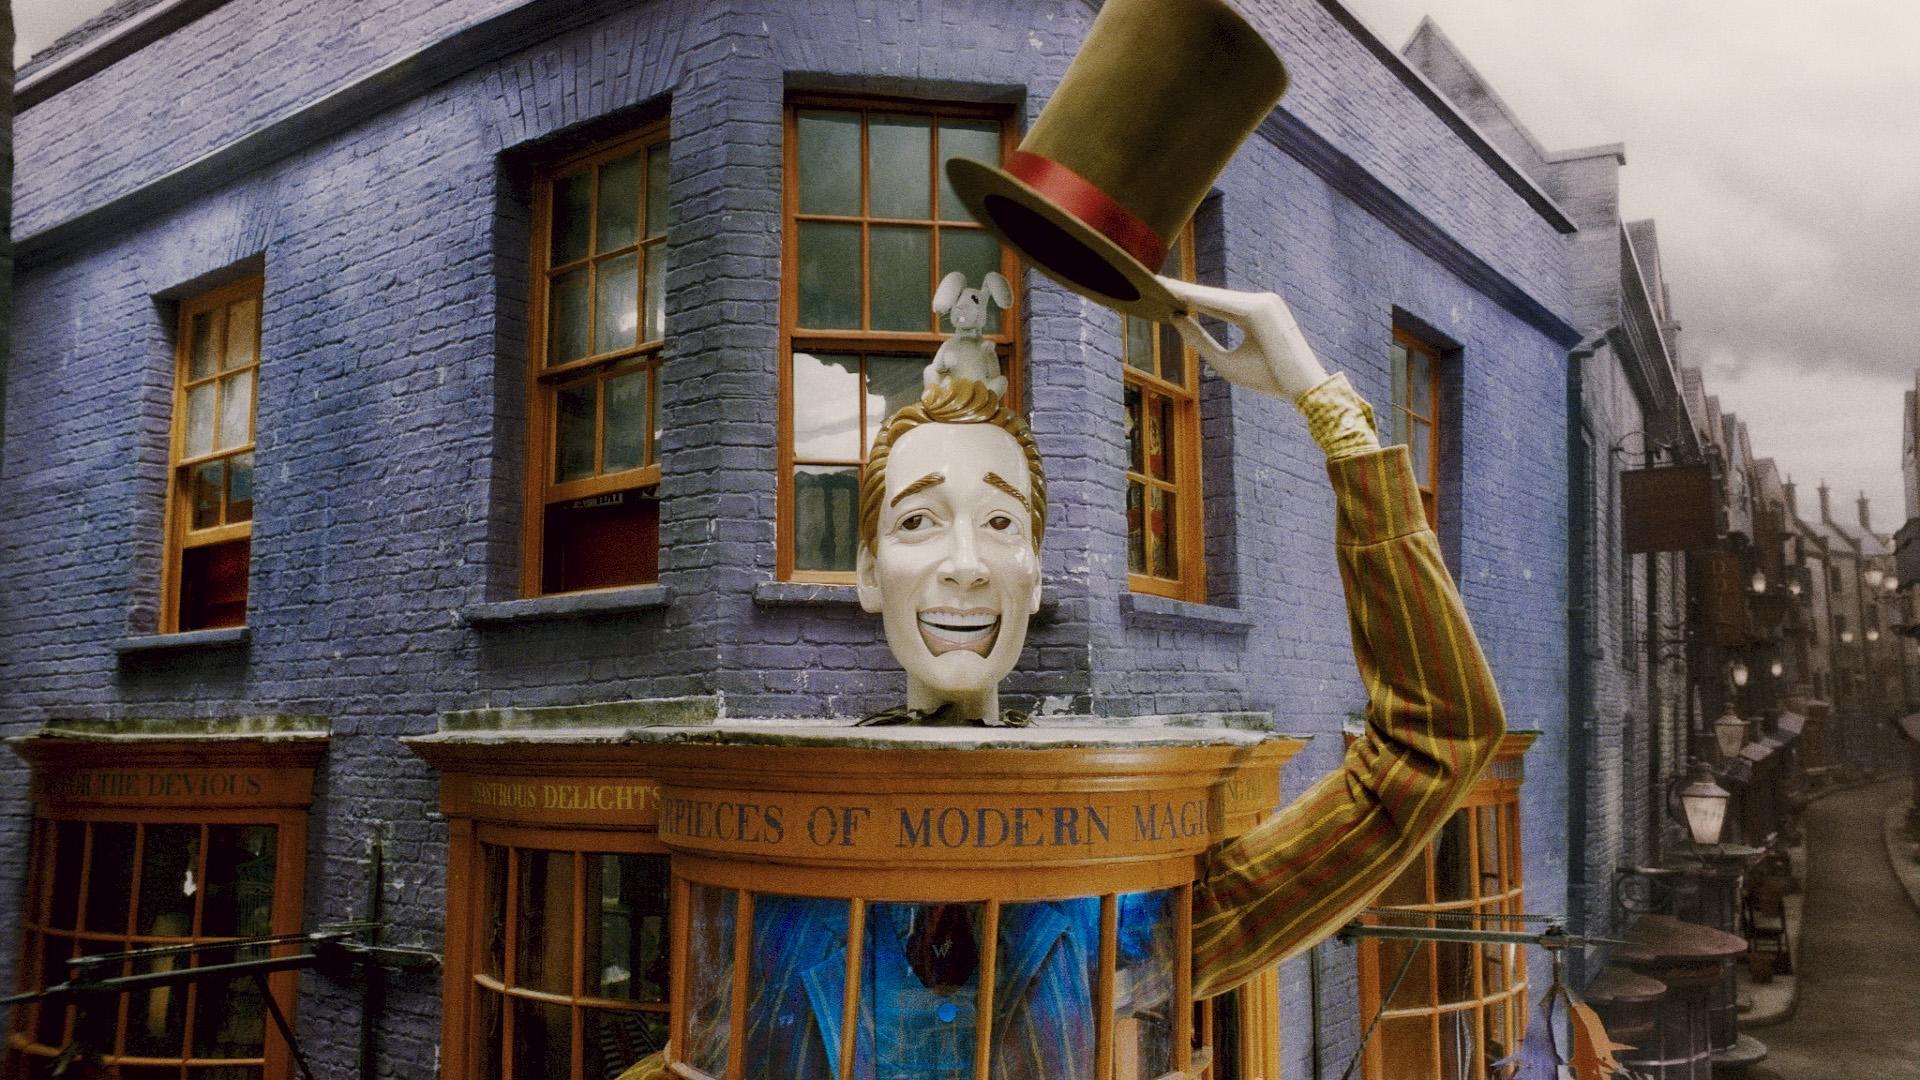 weasleys wizard wheezes harry potter wallpaper